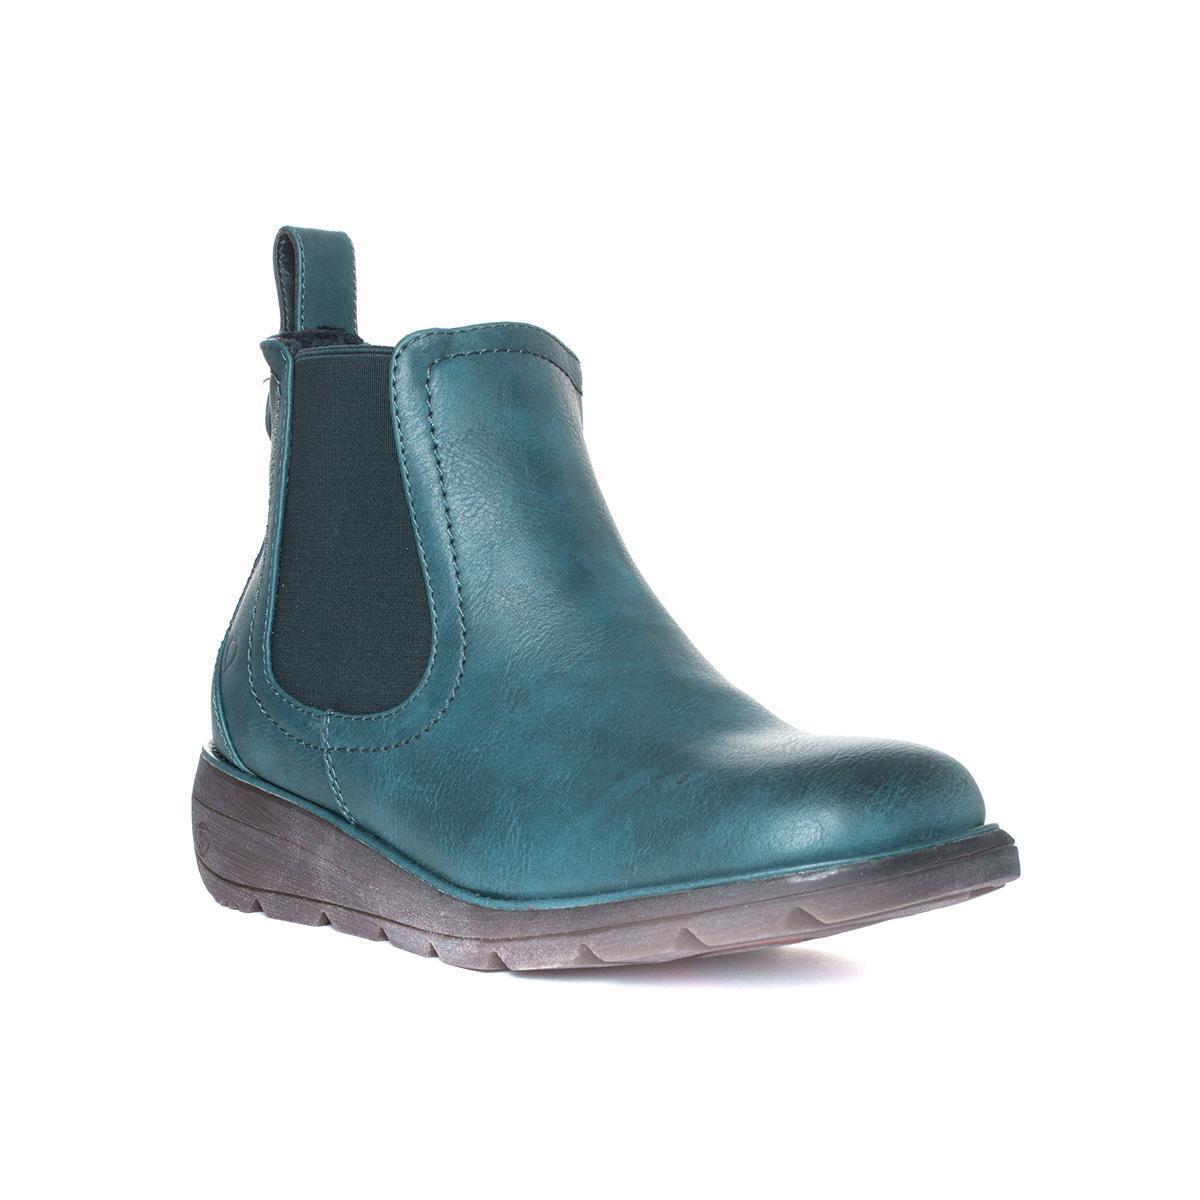 Heavenly Feet Womens bluee Wedge Boot - Sizes 3,4,5,6,7,8